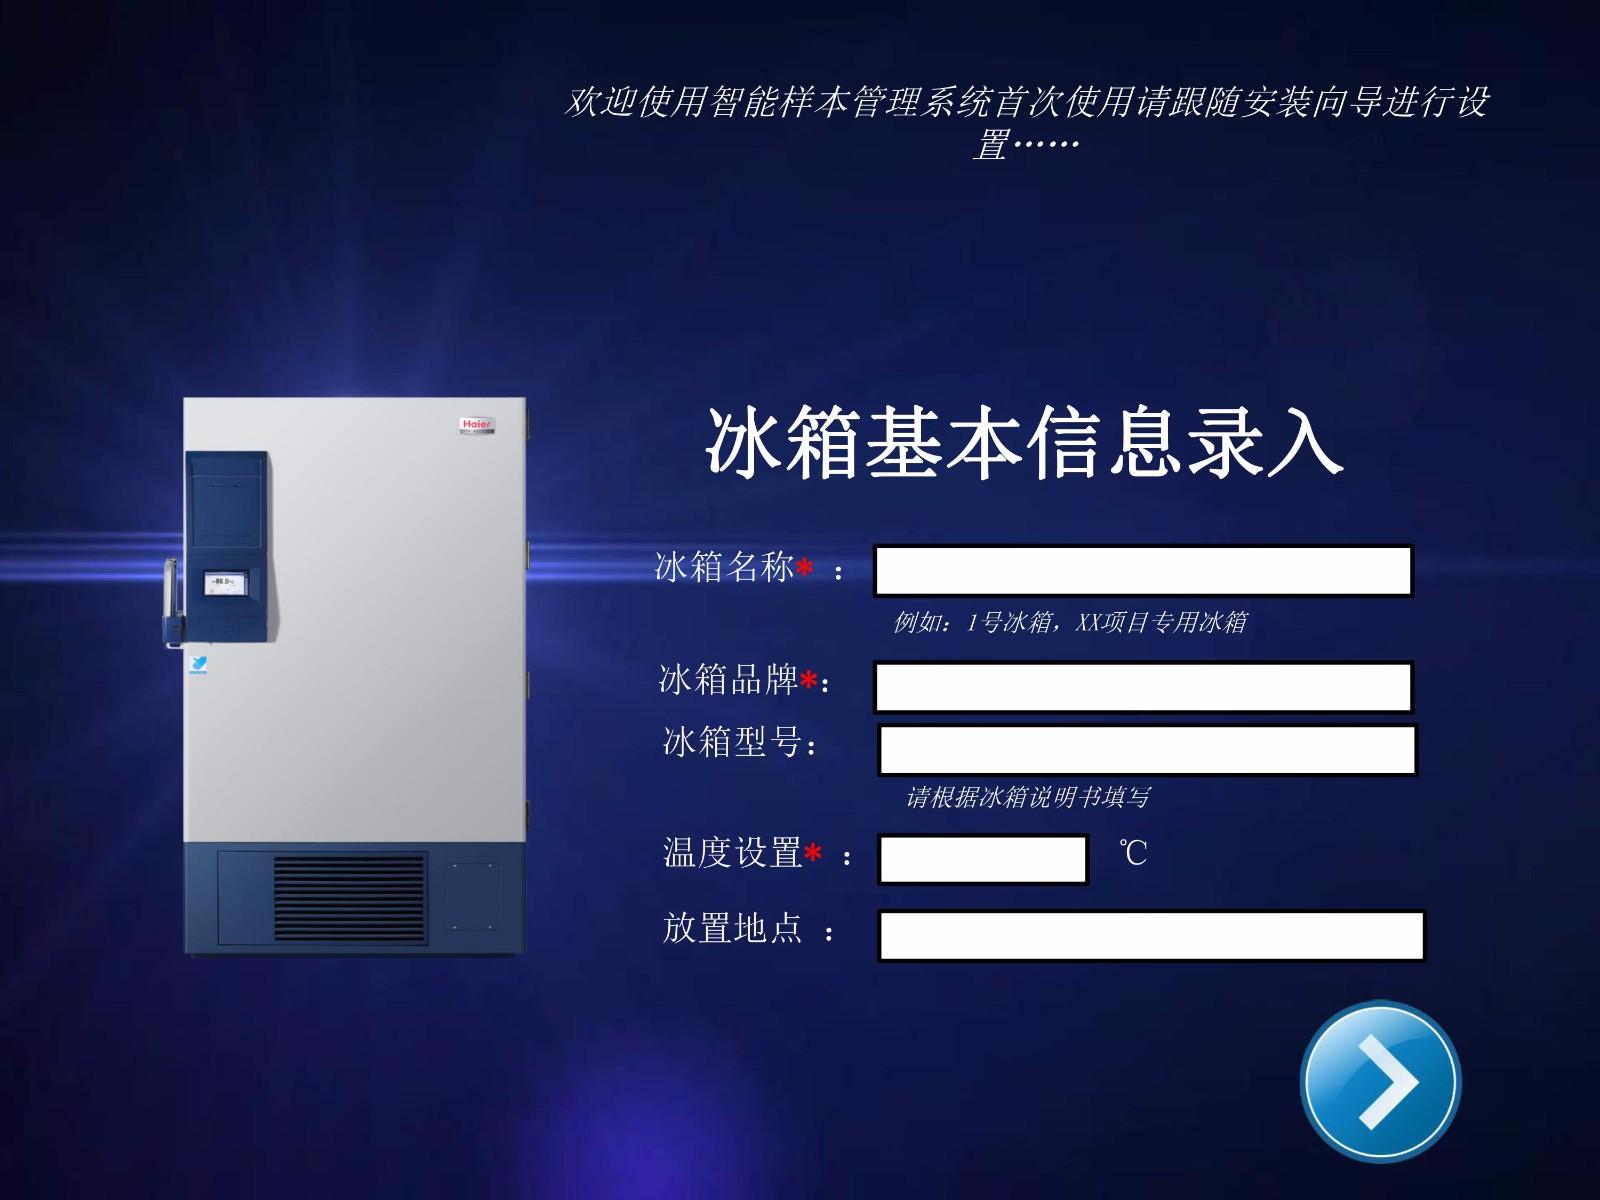 RFID智能样本管理系统|RFID智能样本管理系统-北京领唐软件开发有限公司